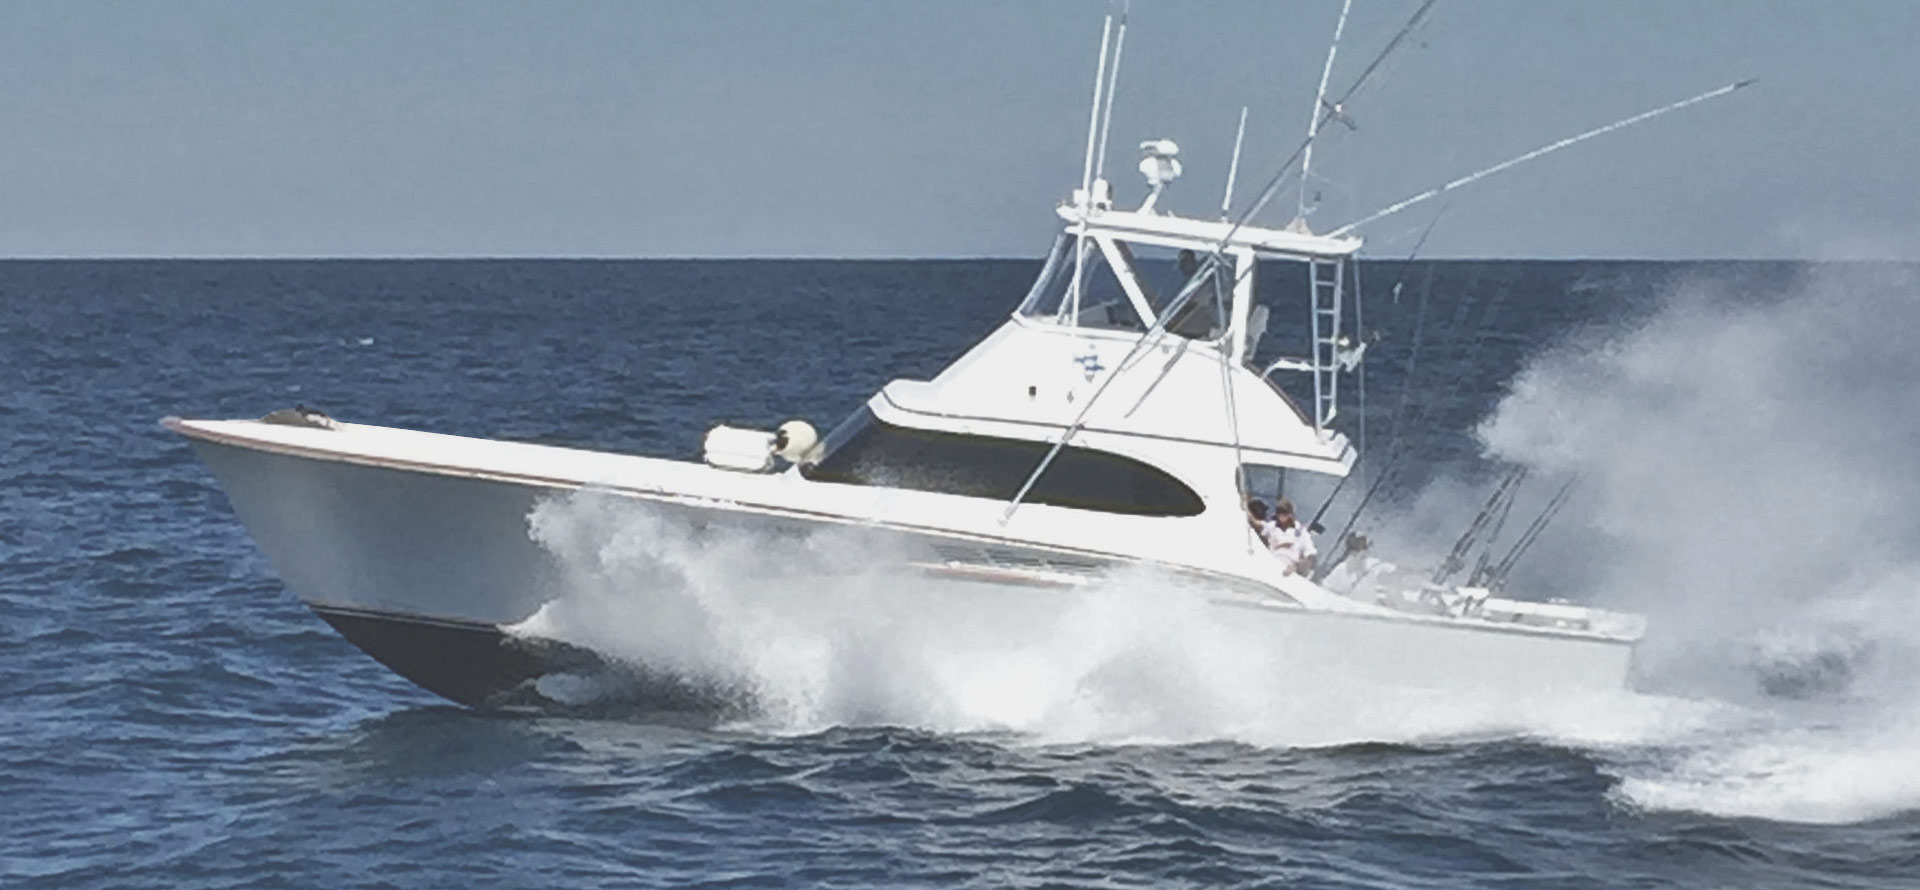 J HOOK Luxury Fishing ChartersAvailable Fishing Charters | J